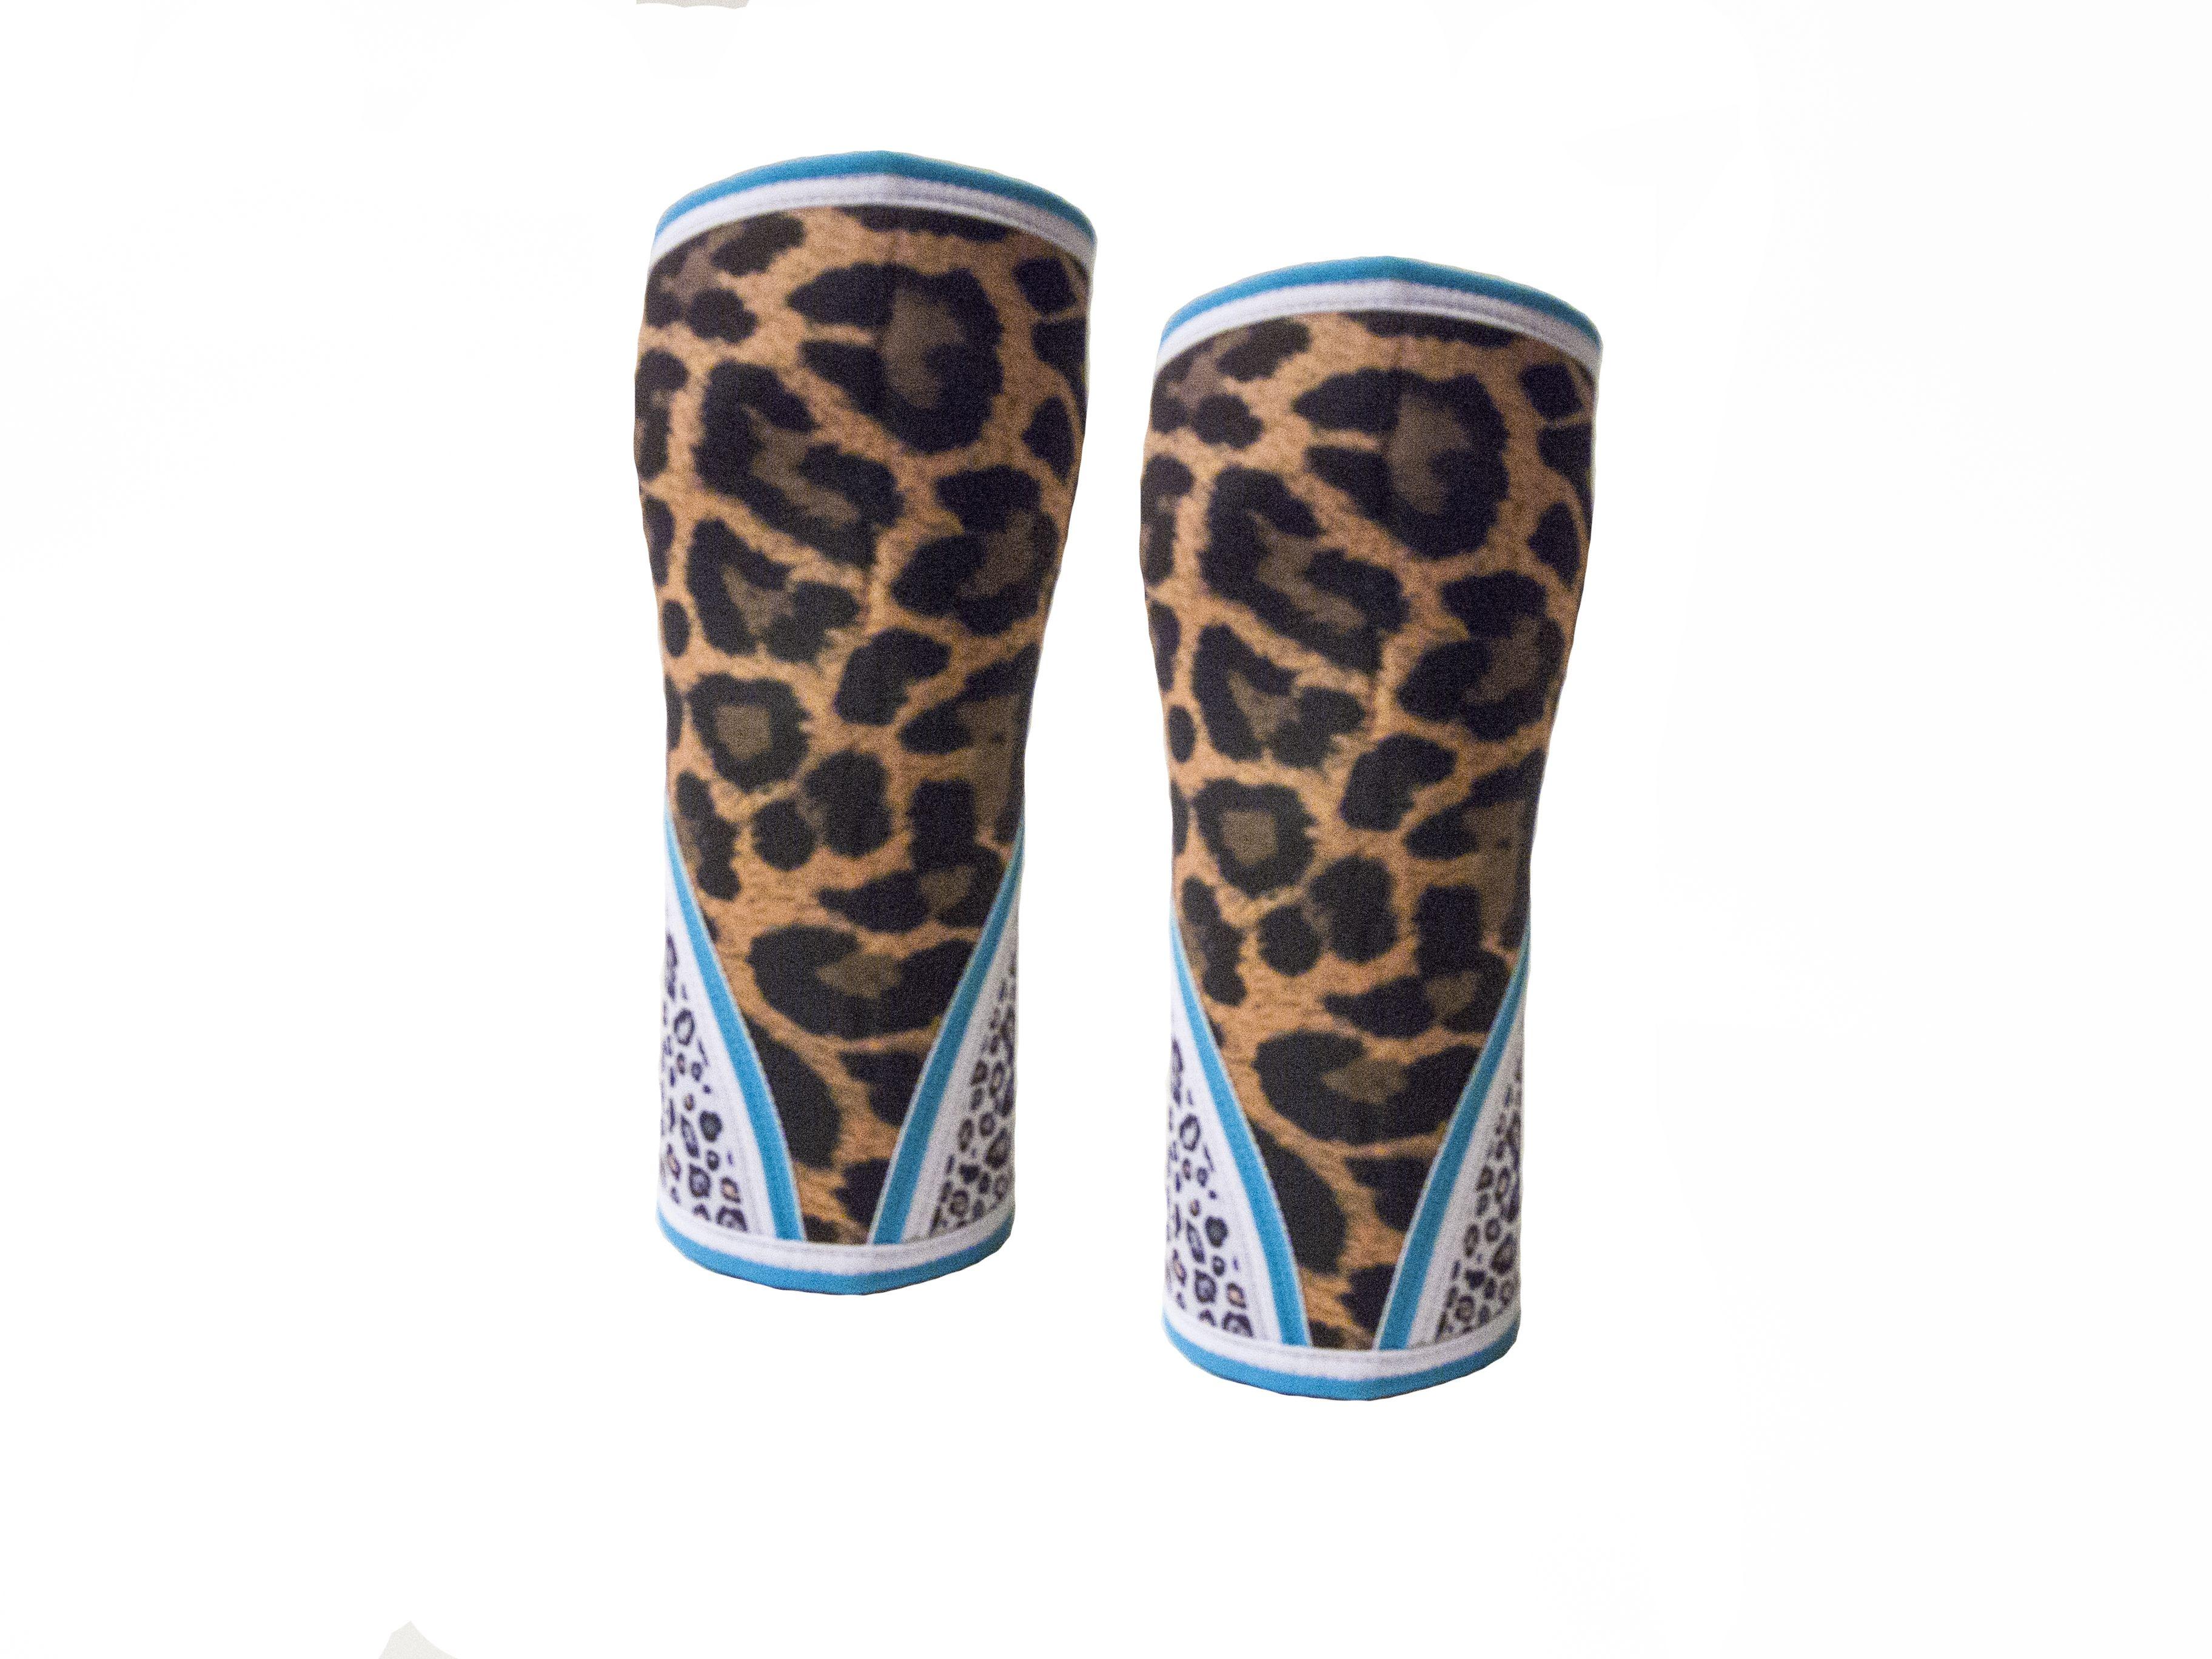 Pin By Unbroken Designs On Sport Knee Sleeves Knee Compression Sleeve Crossfit Gear